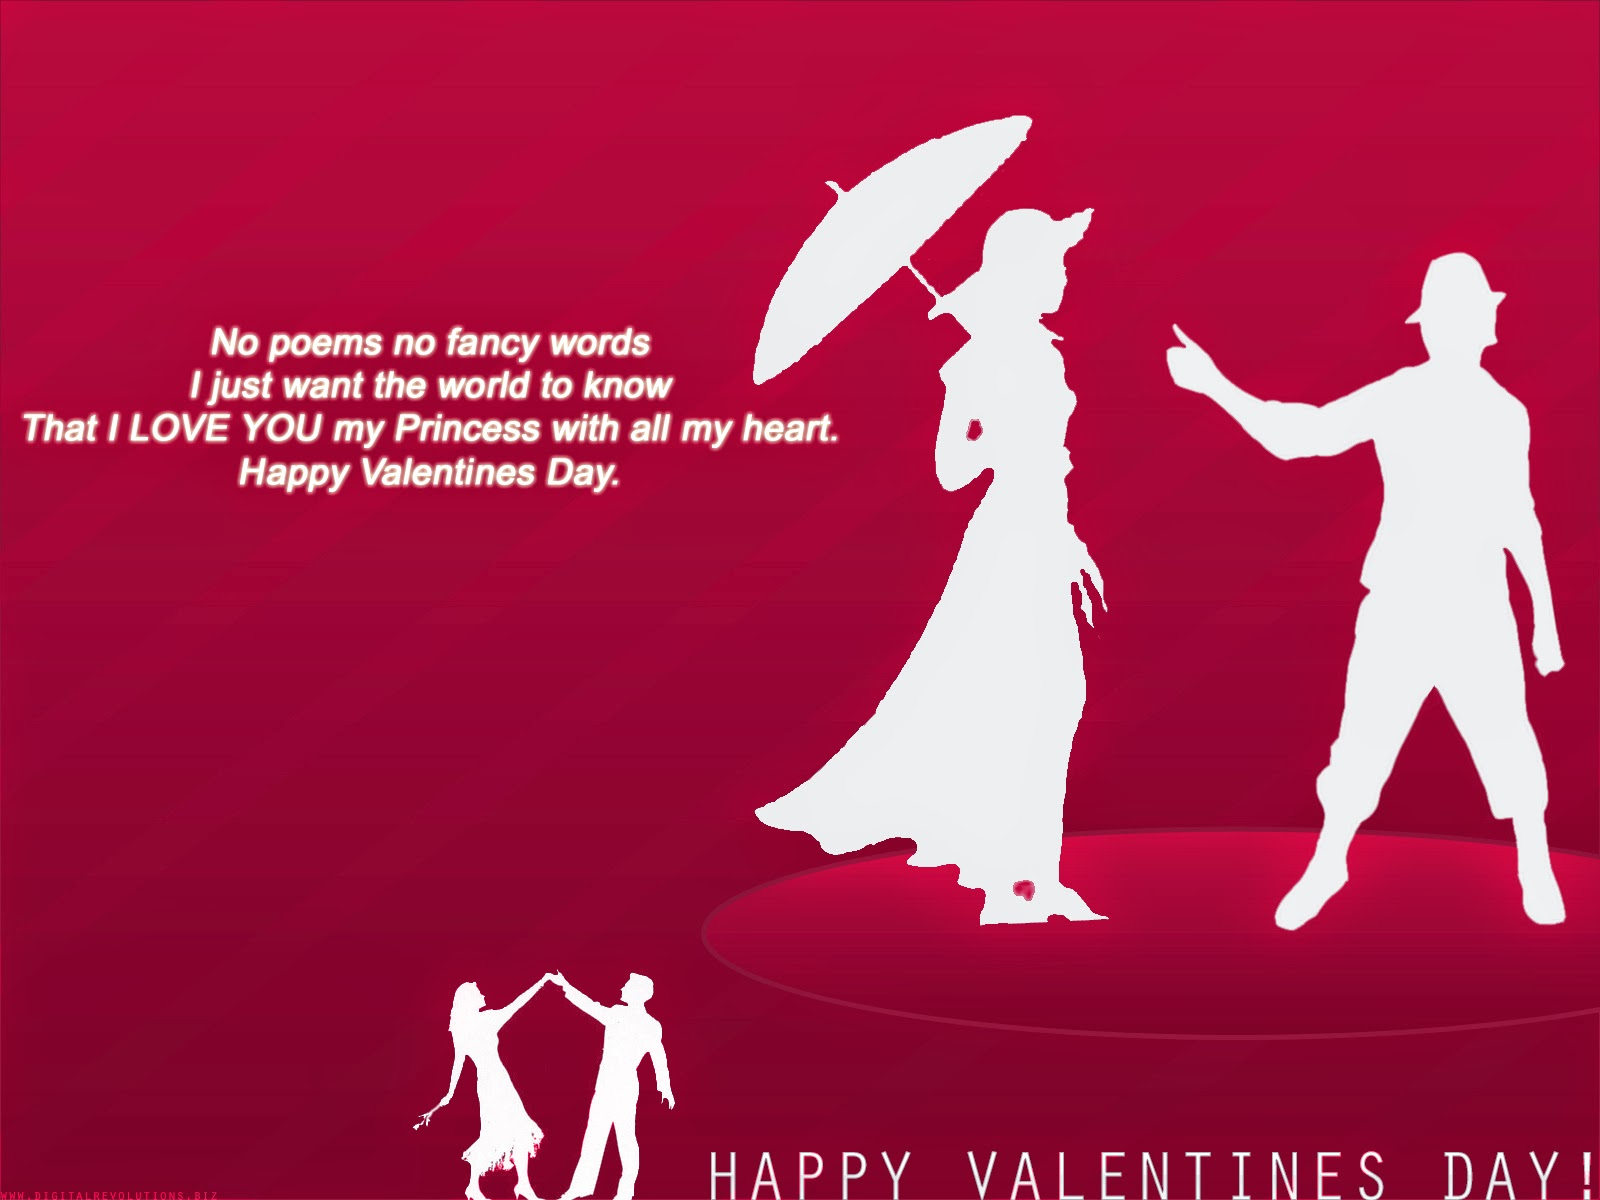 valentines day 2016 - Why We Celebrate Valentine Day